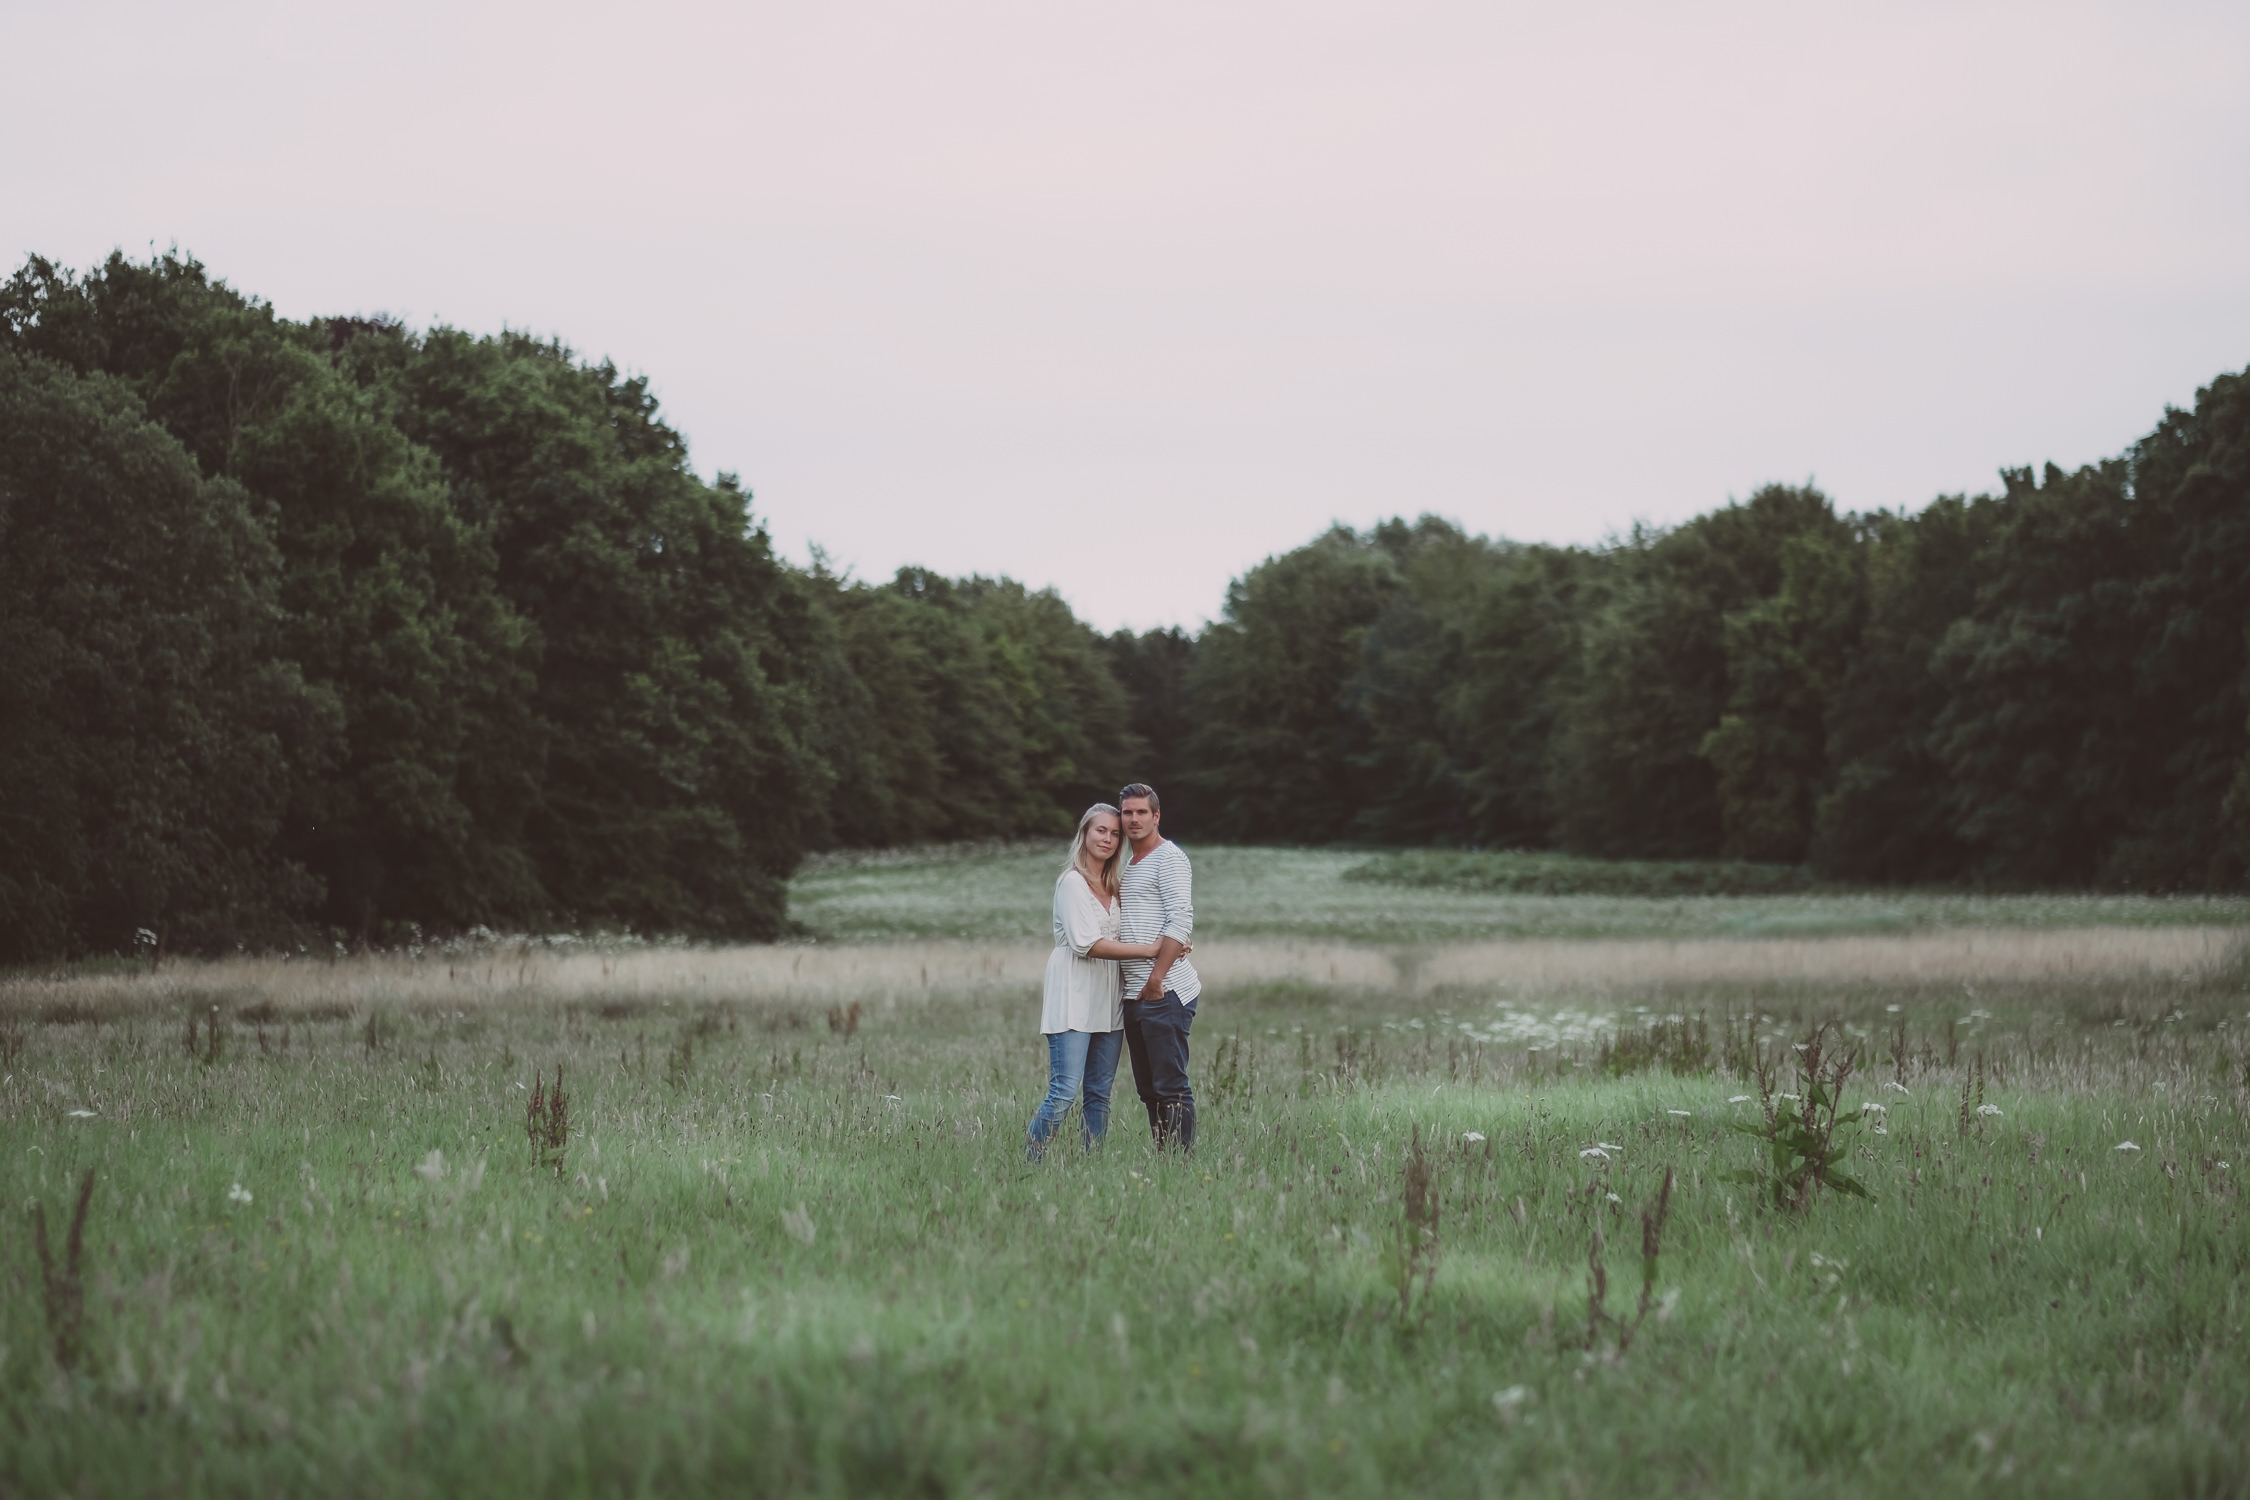 mark-hadden-amsterdam-wedding-photographer-bruidsfotograaf-bruidsfotografie-loveshoot-charlotte-and-bart-167.jpg